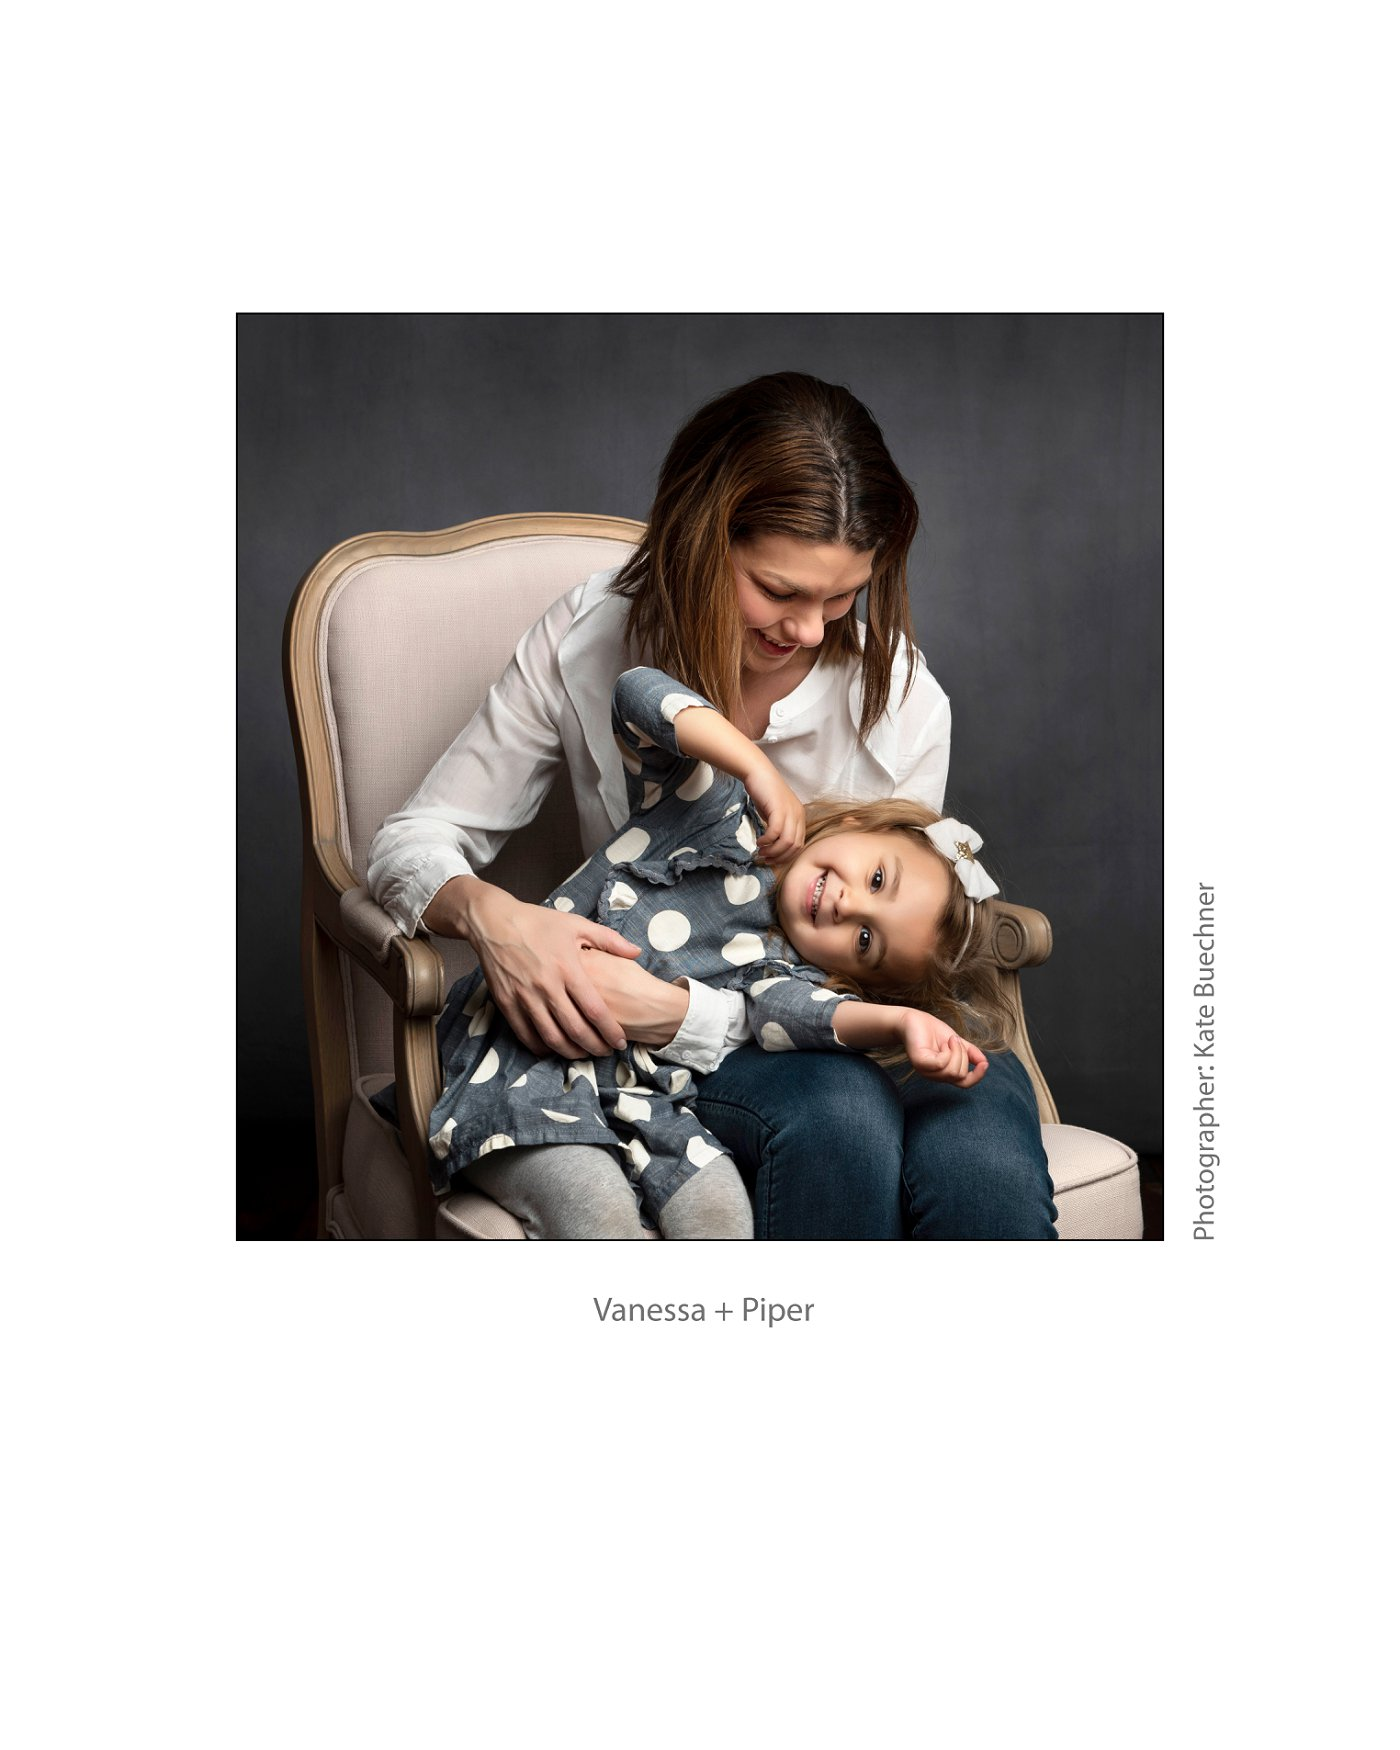 family-photographer-sydney (16).jpg